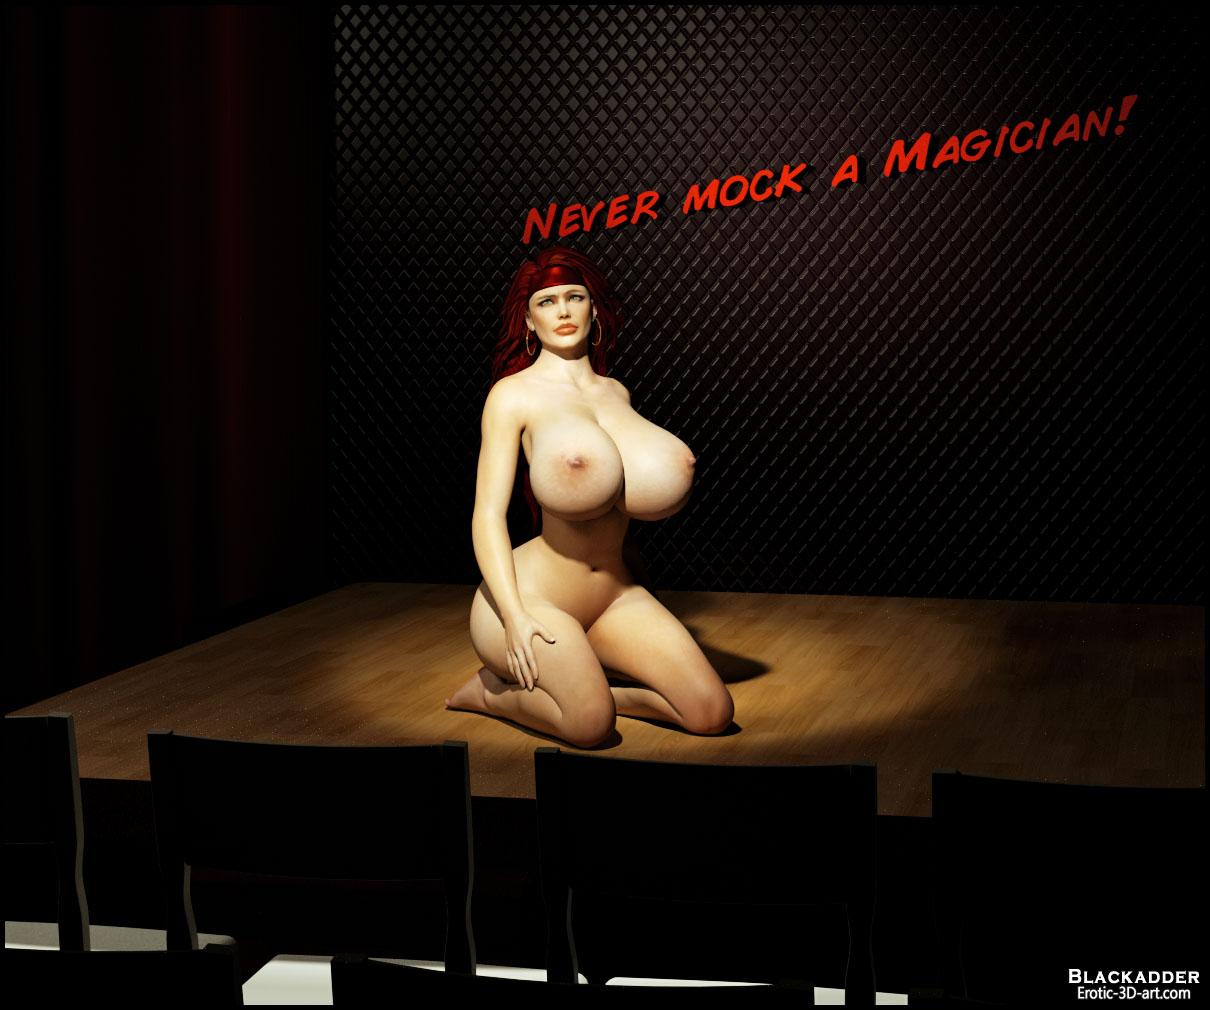 Erotic-3d-art sexual image